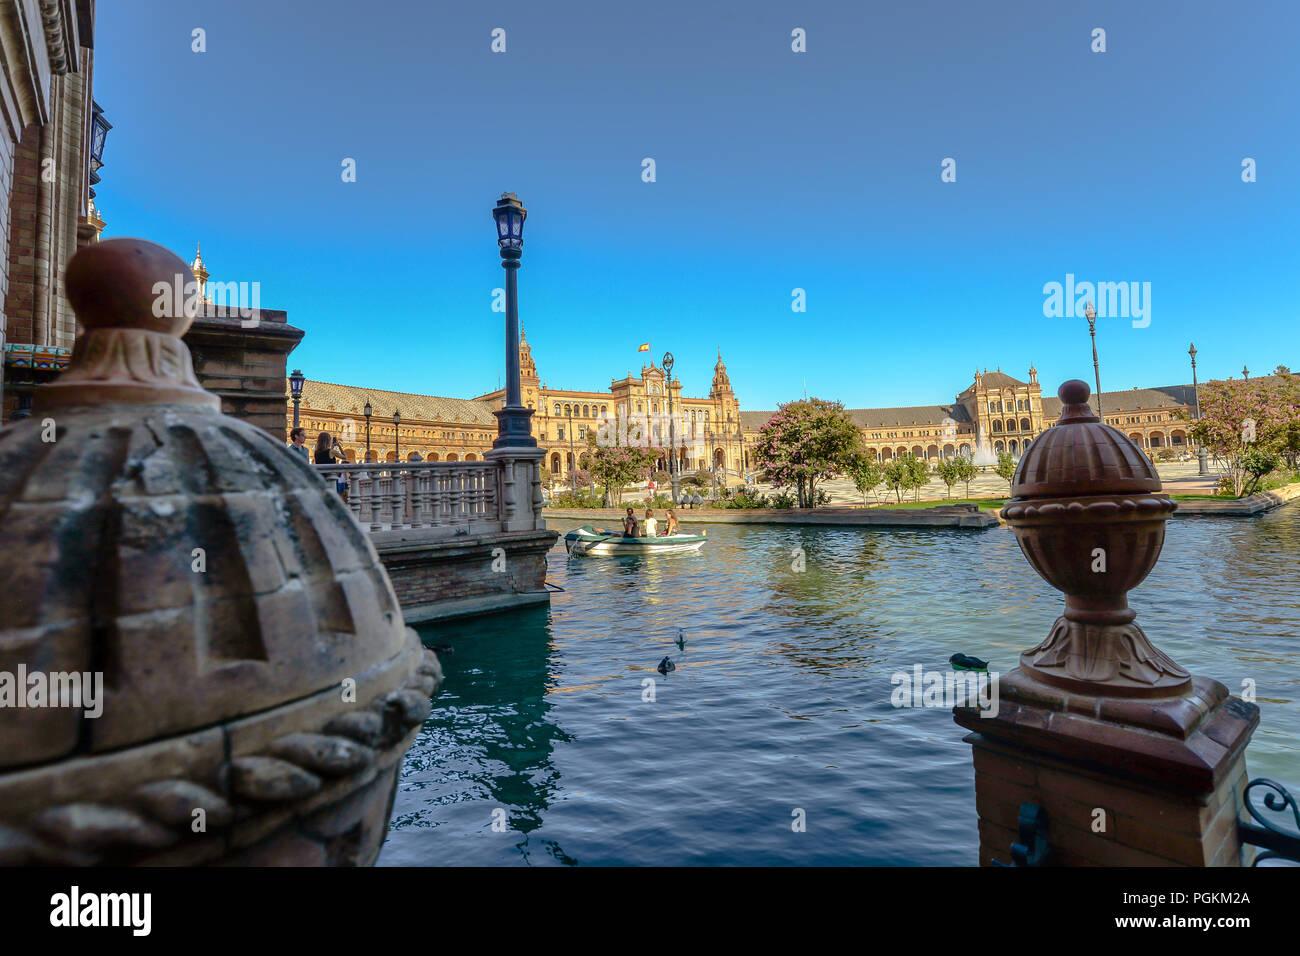 Plaza Espana - Seville - Spain - Stock Image